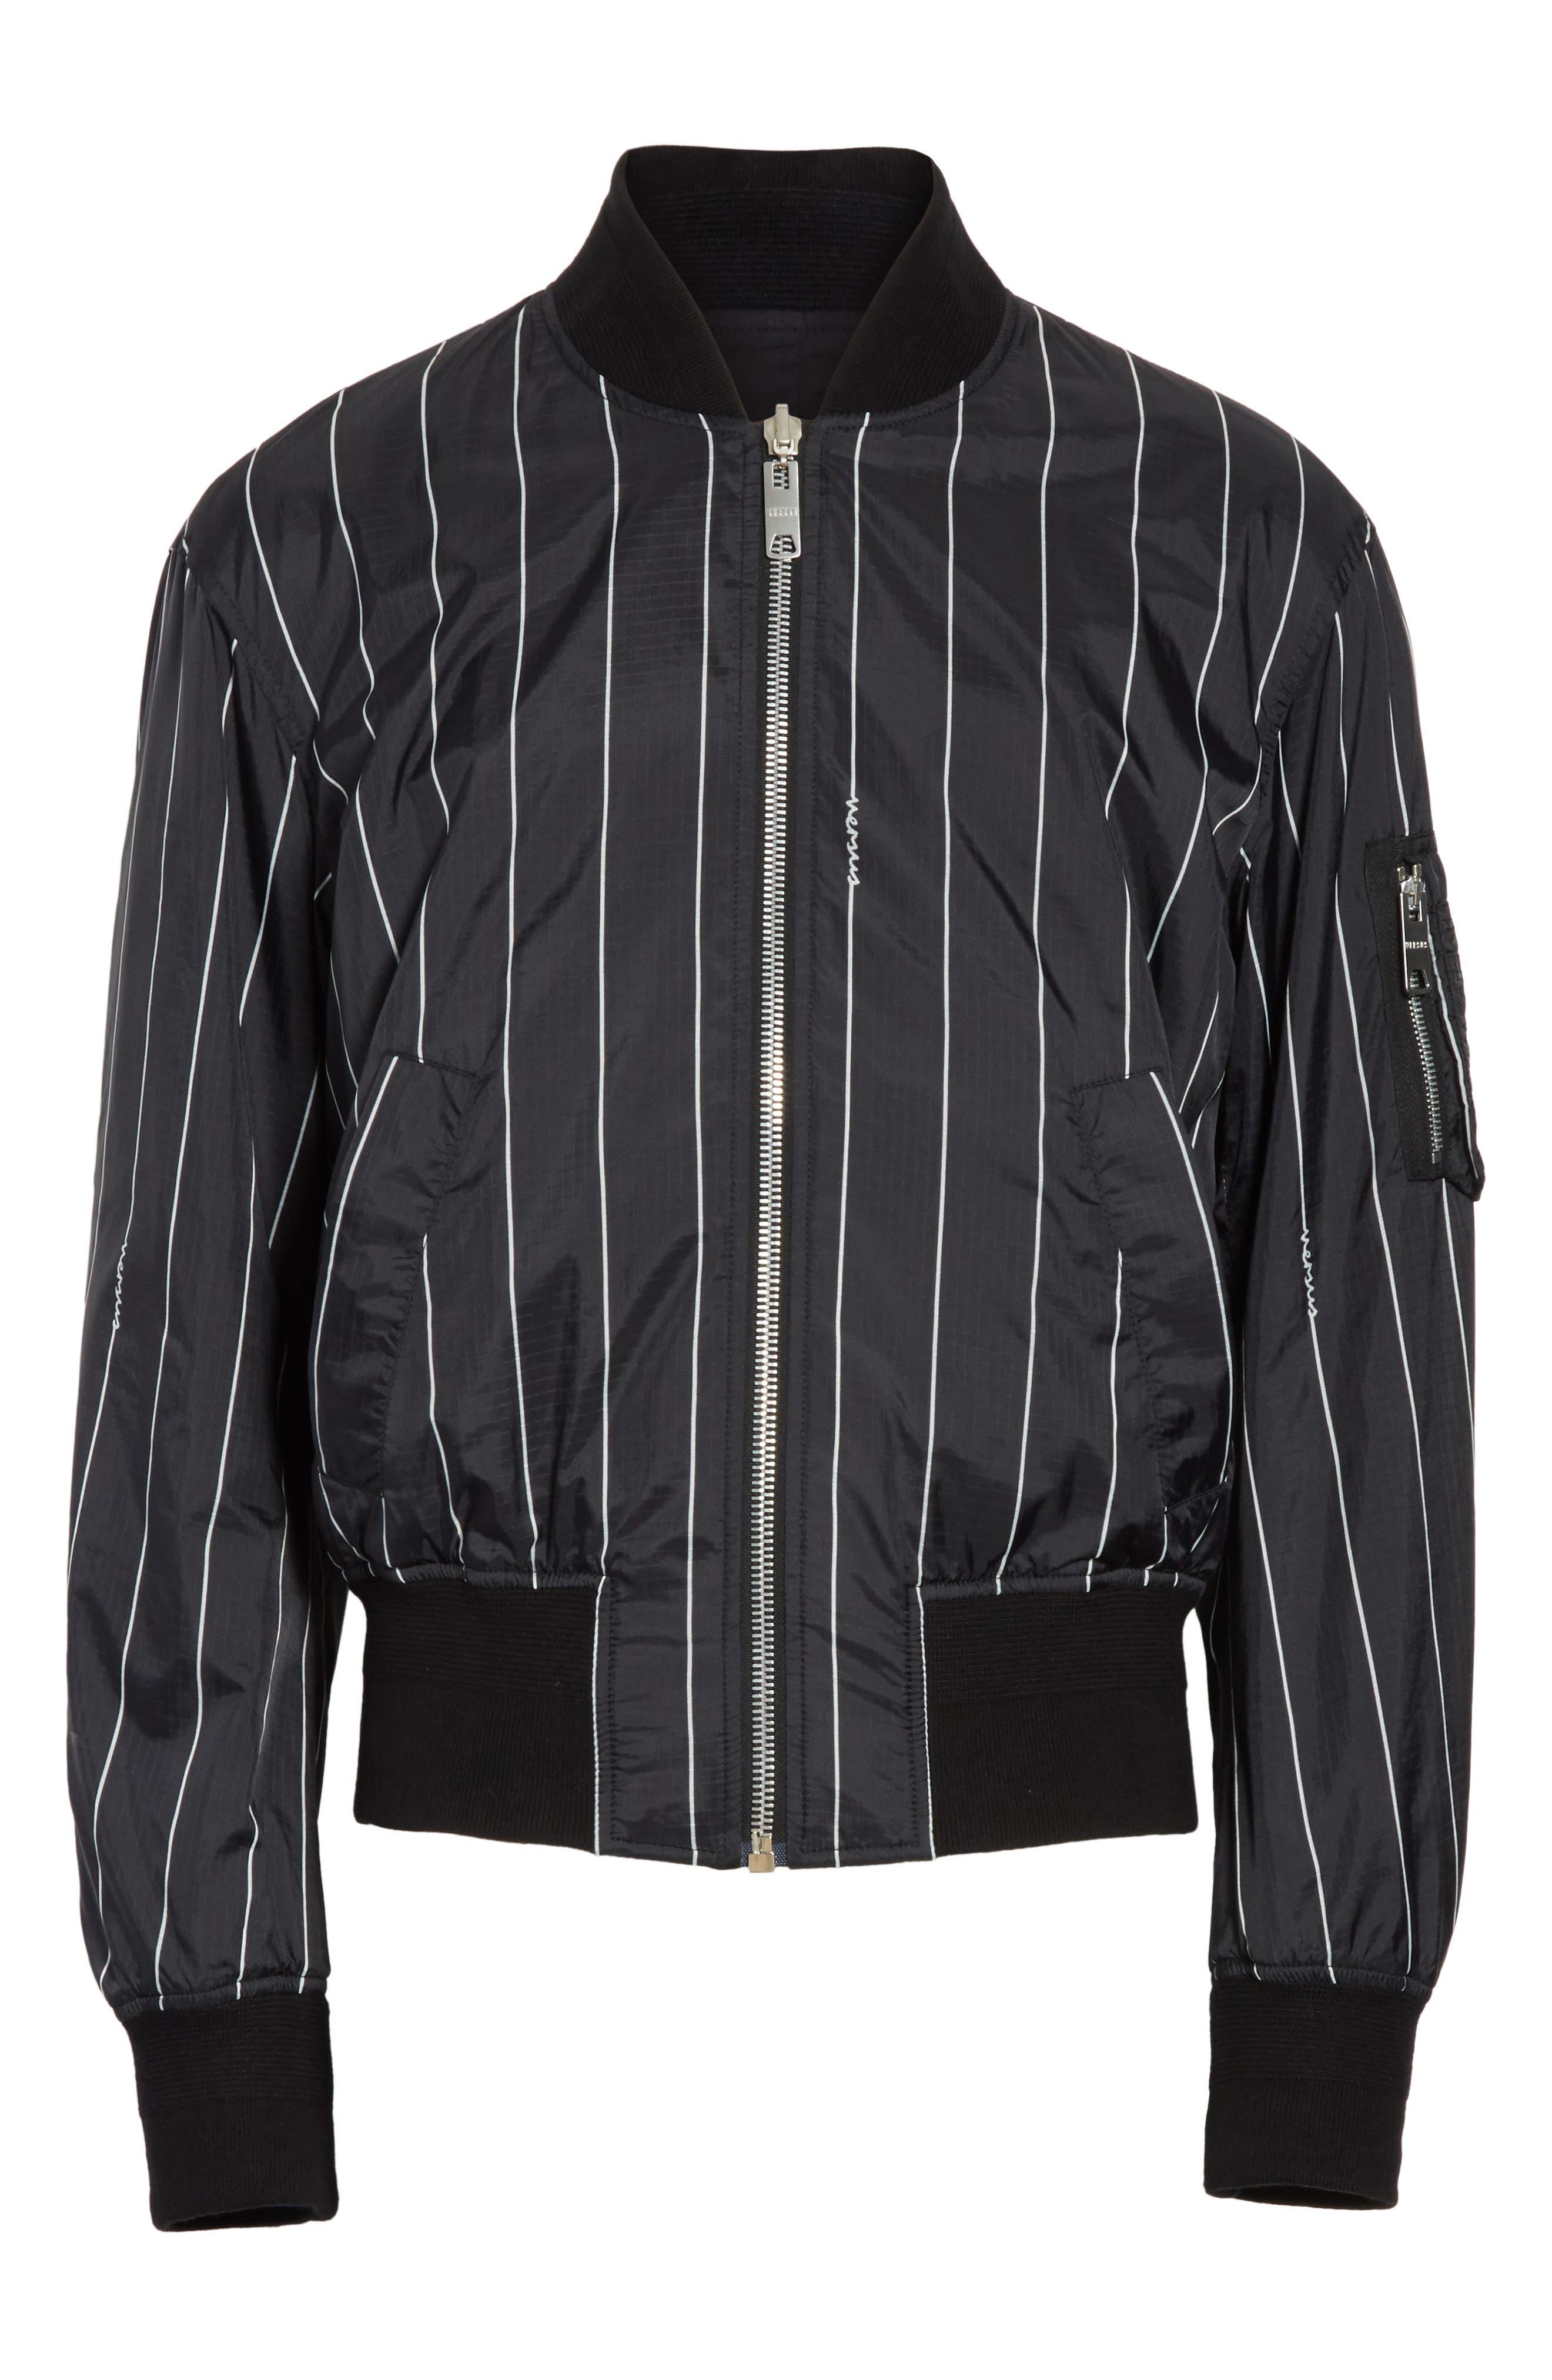 VERSUS by Versace Reversible Pinstripe Bomber Jacket,                             Alternate thumbnail 6, color,                             Black